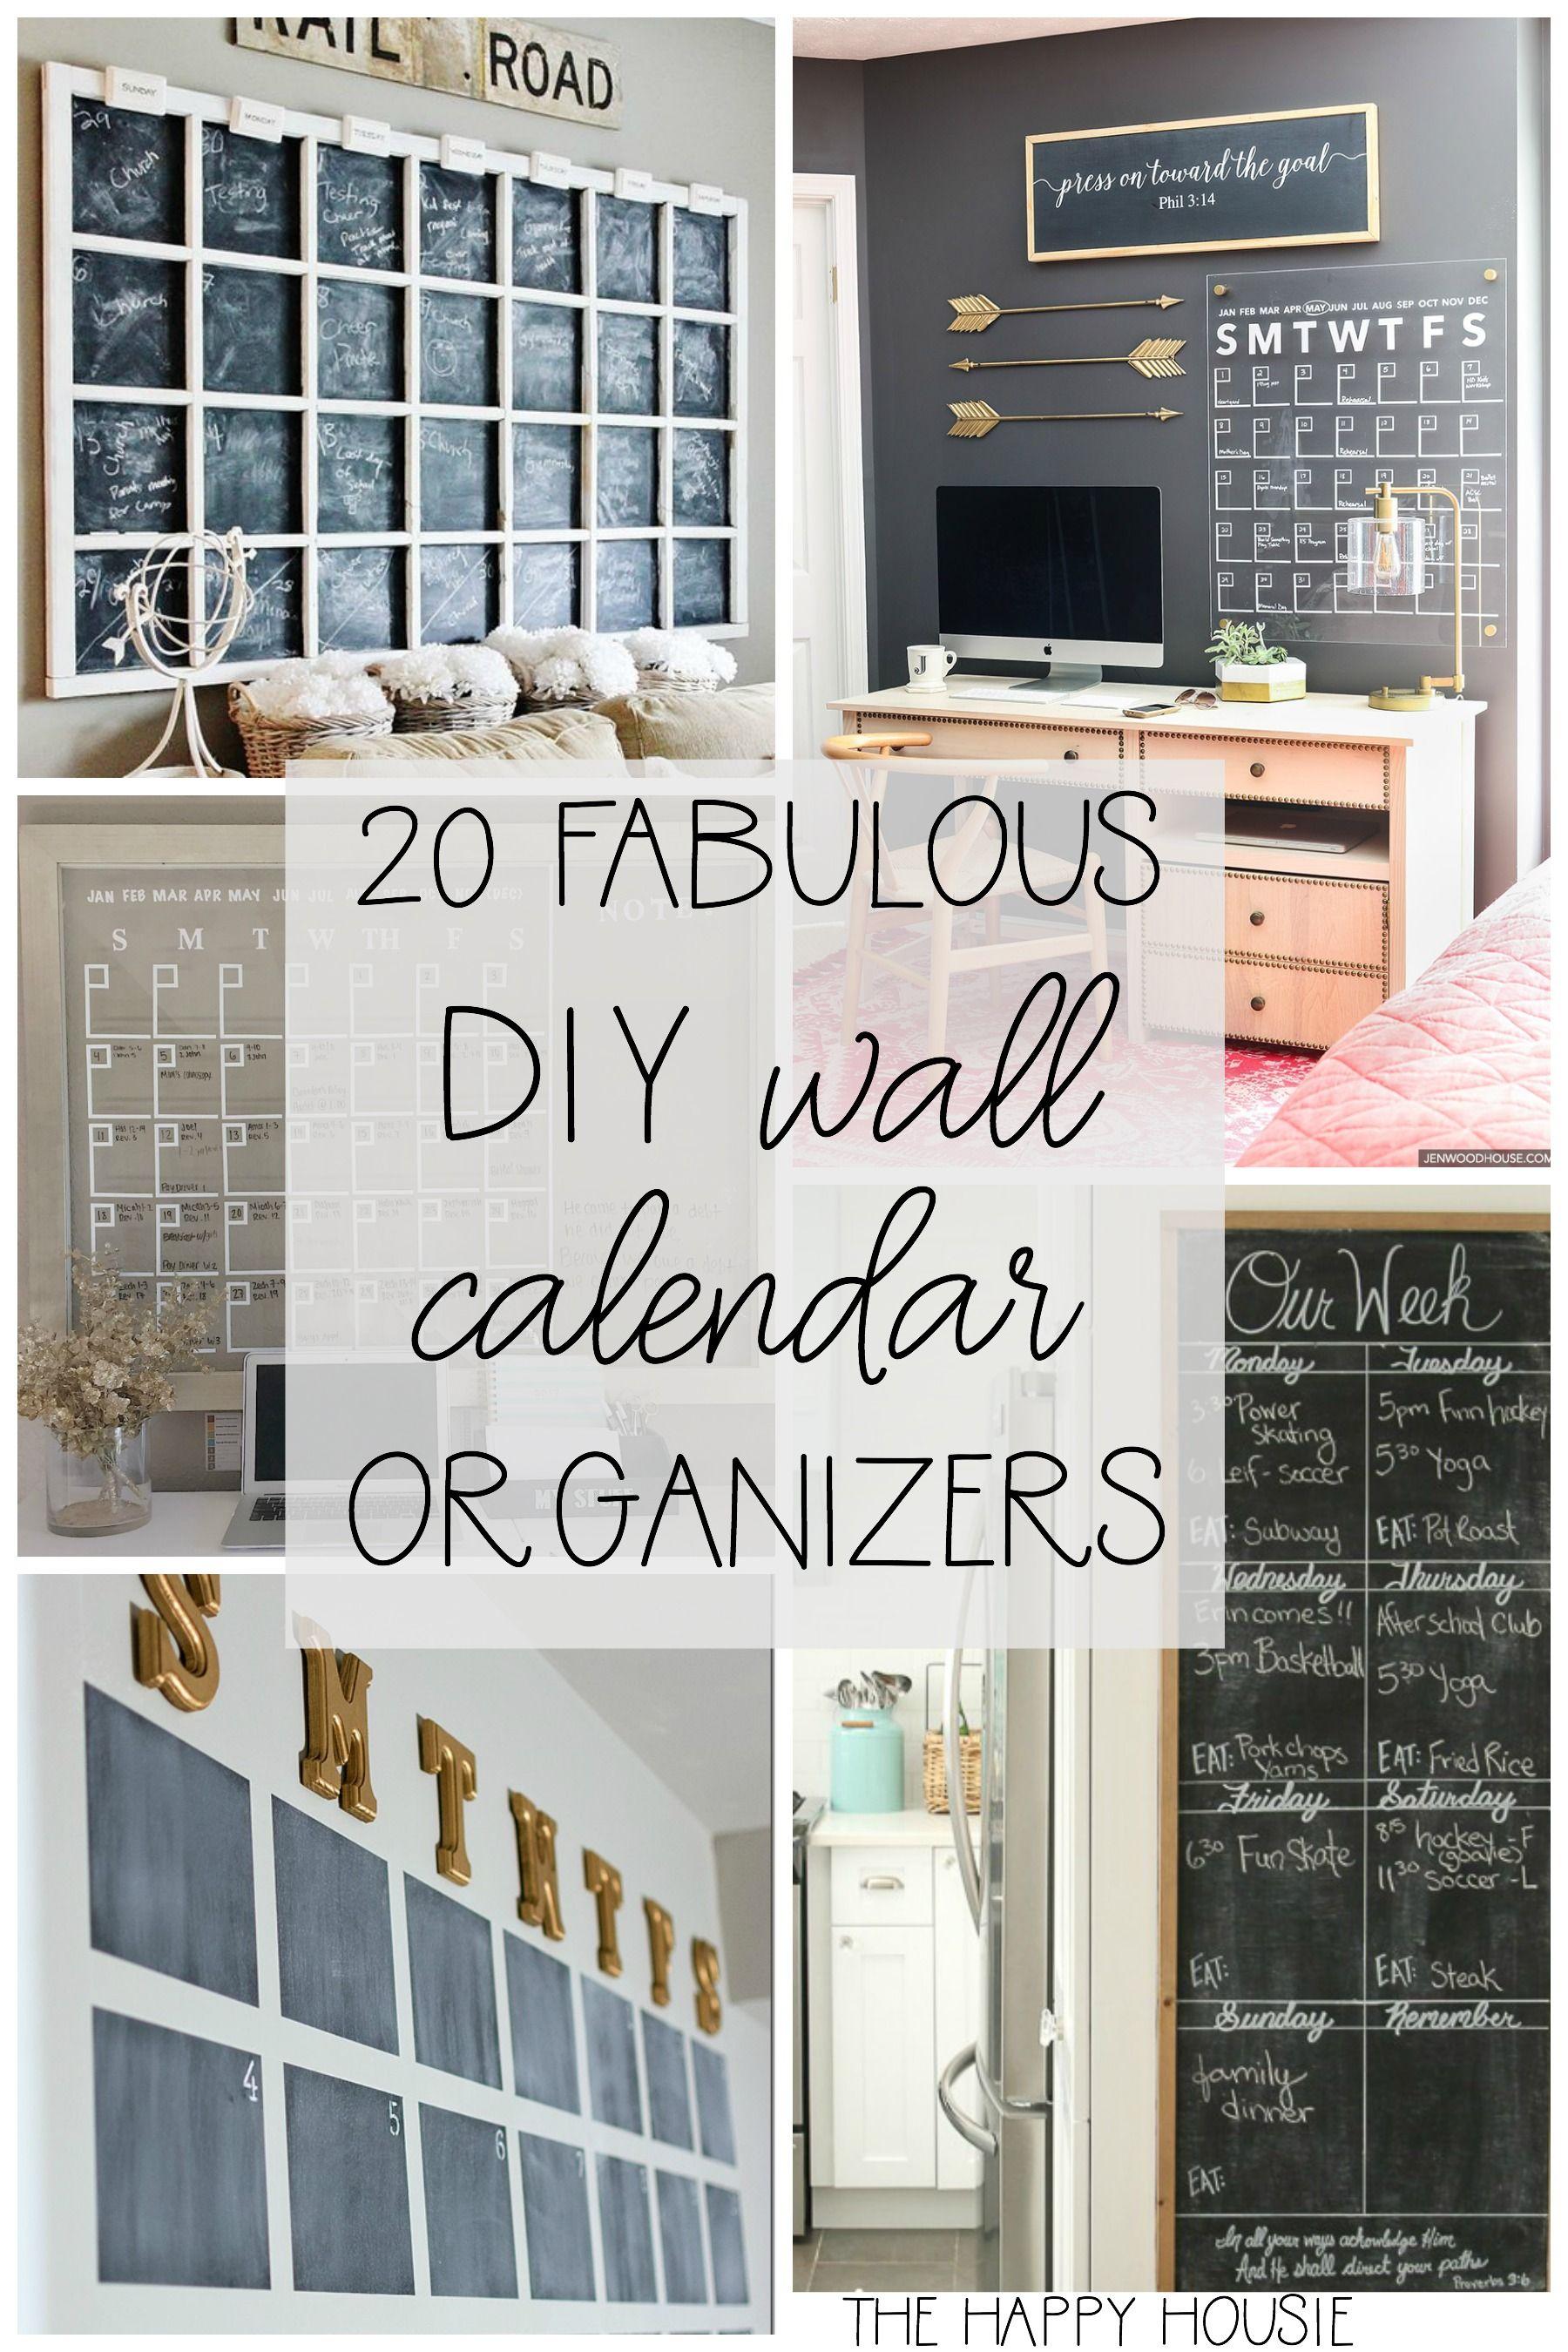 20 Fab Diy Family Wall Calendar Organizers The Happy Housie Wall Calendar Organizer Family Organization Wall